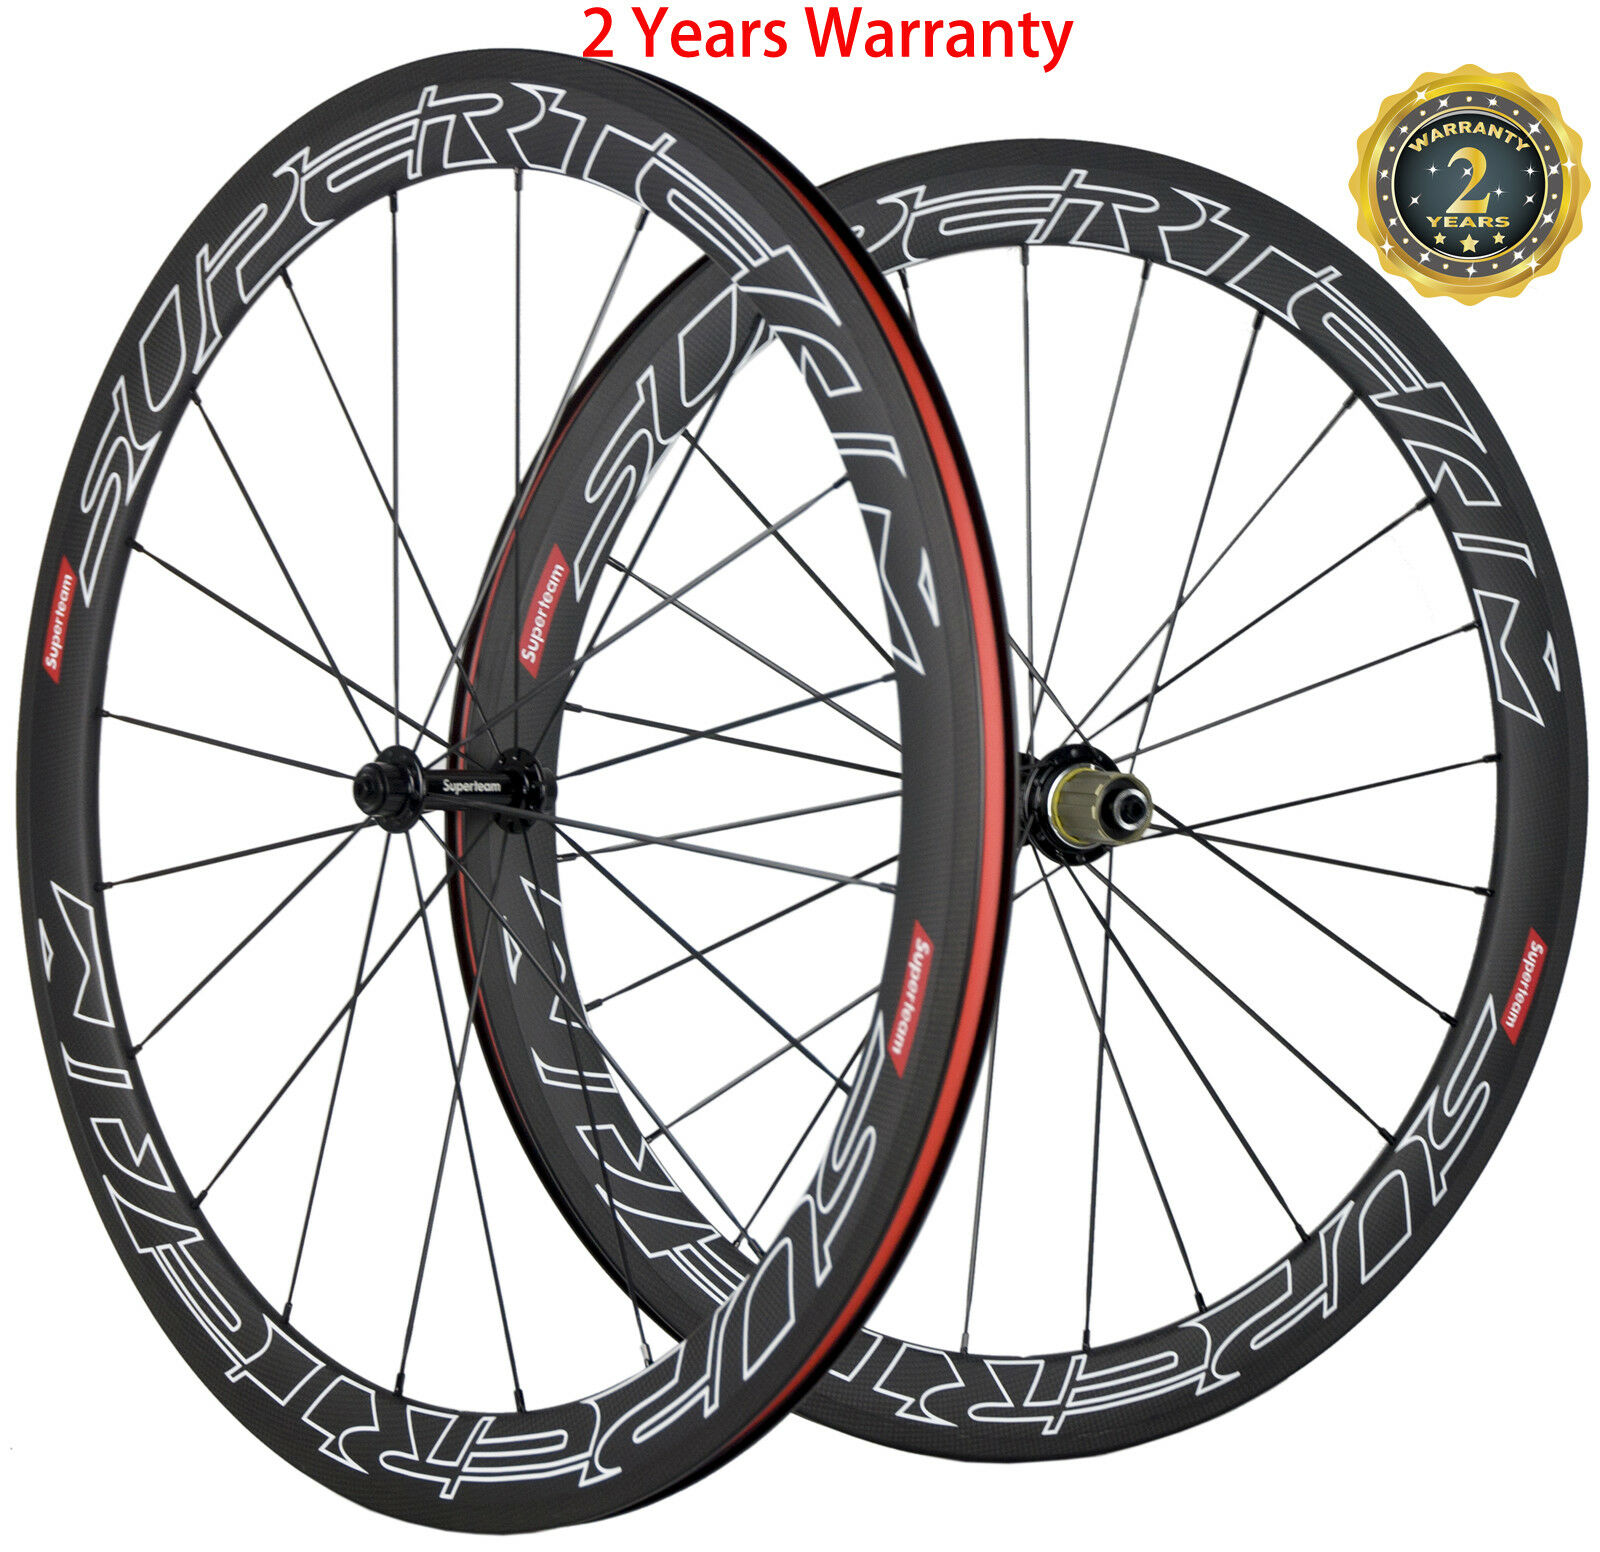 Carbon  Wheels 50mm Depth Clincher 23mm Width Road Bike Wheels 700C Race Whheels  shop clearance